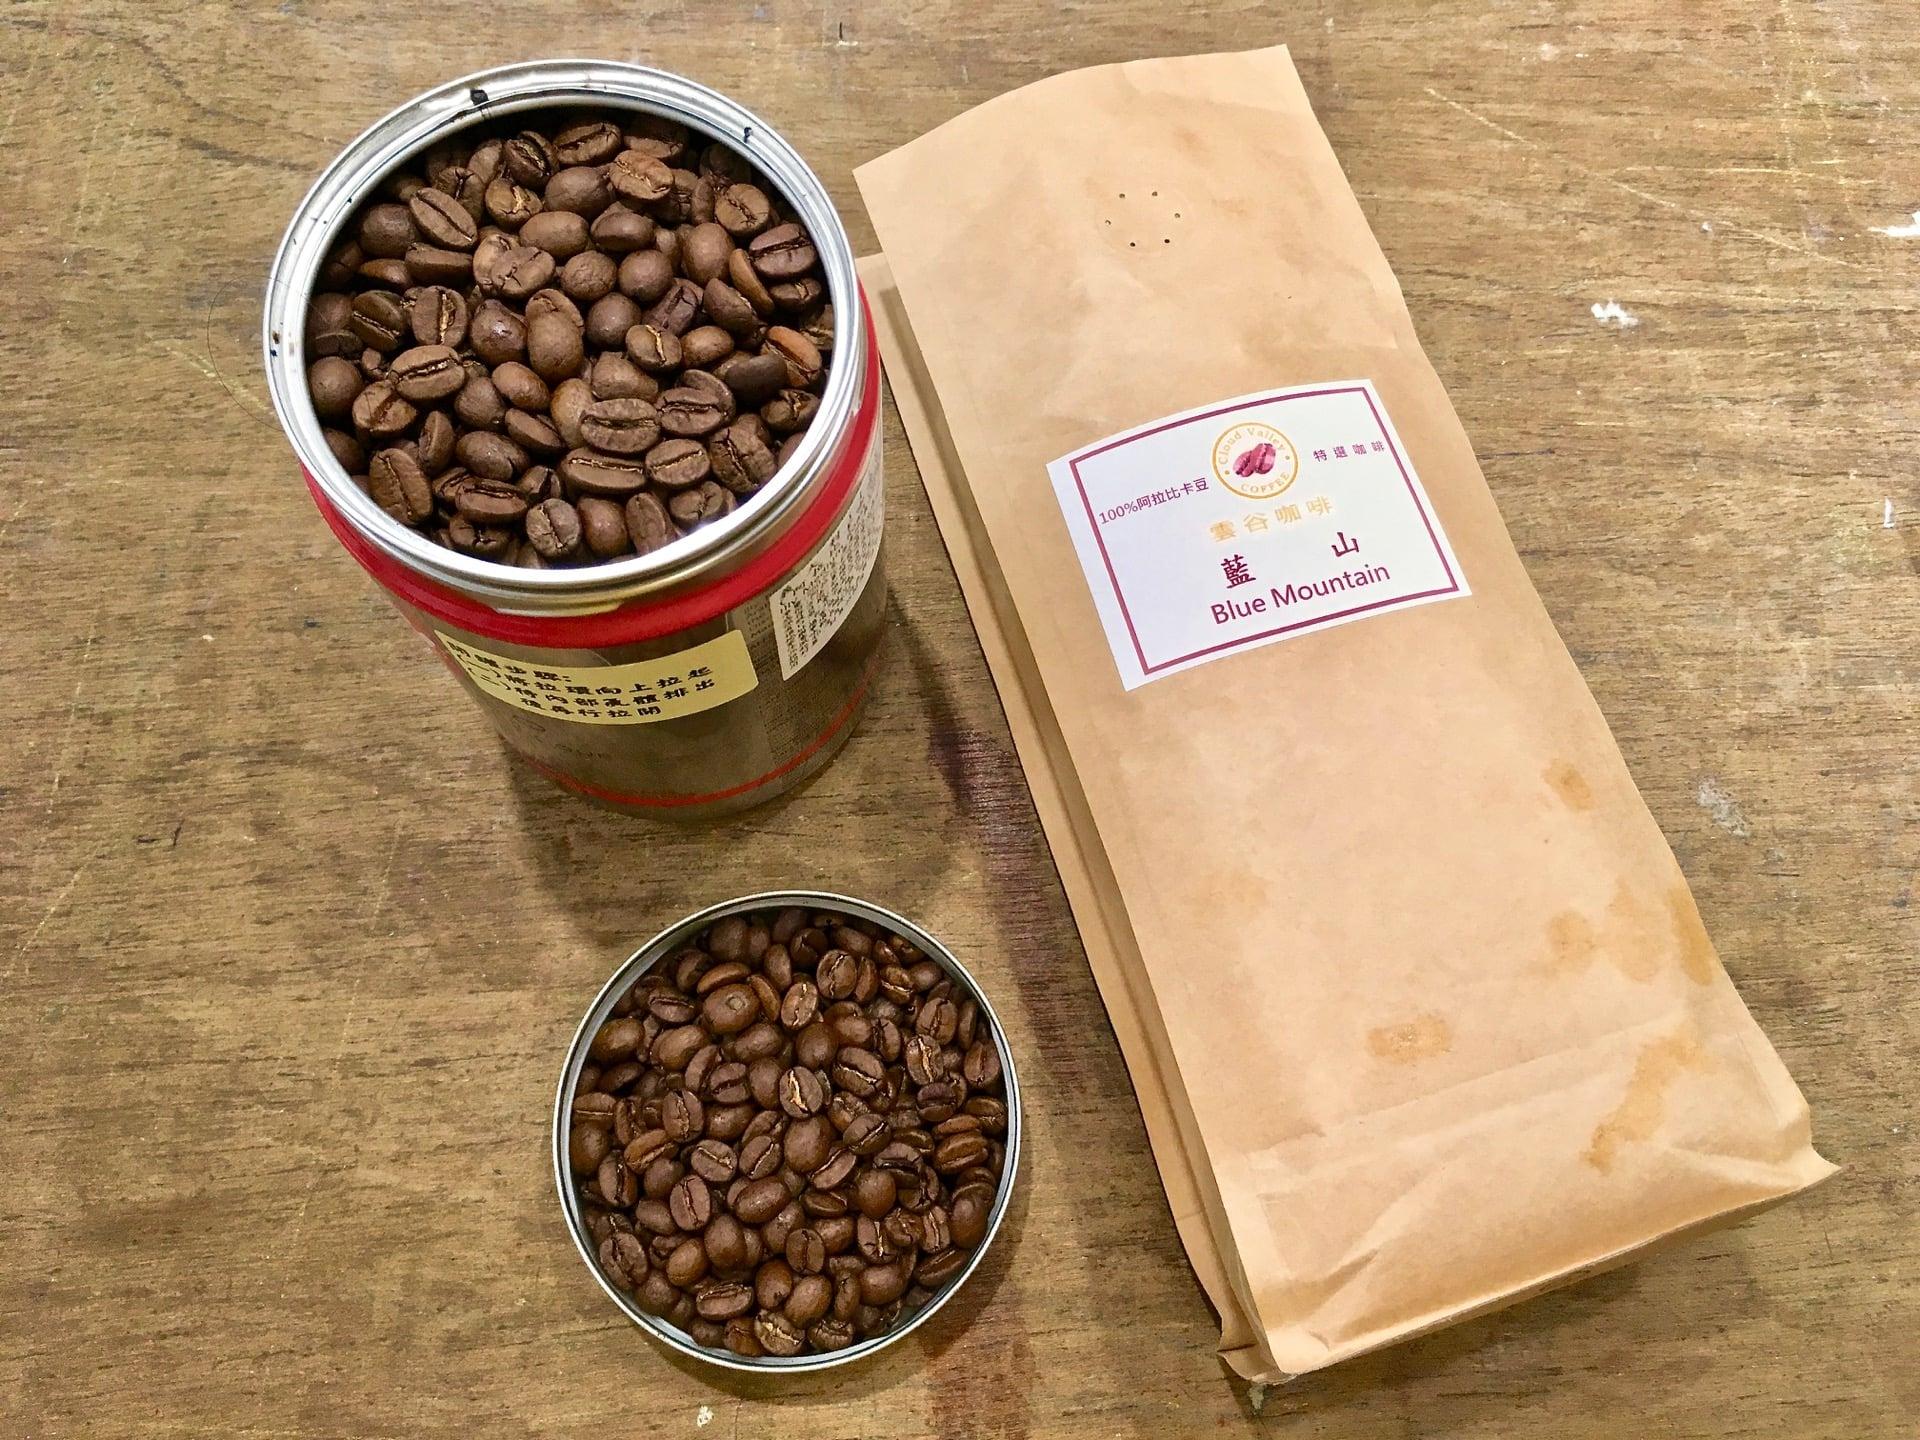 Yungu Blue Mountain Taiwan ROC 網購咖啡豆 上田、雲谷、川雲、大隱四大品牌 ☕️ 飲咖啡心得